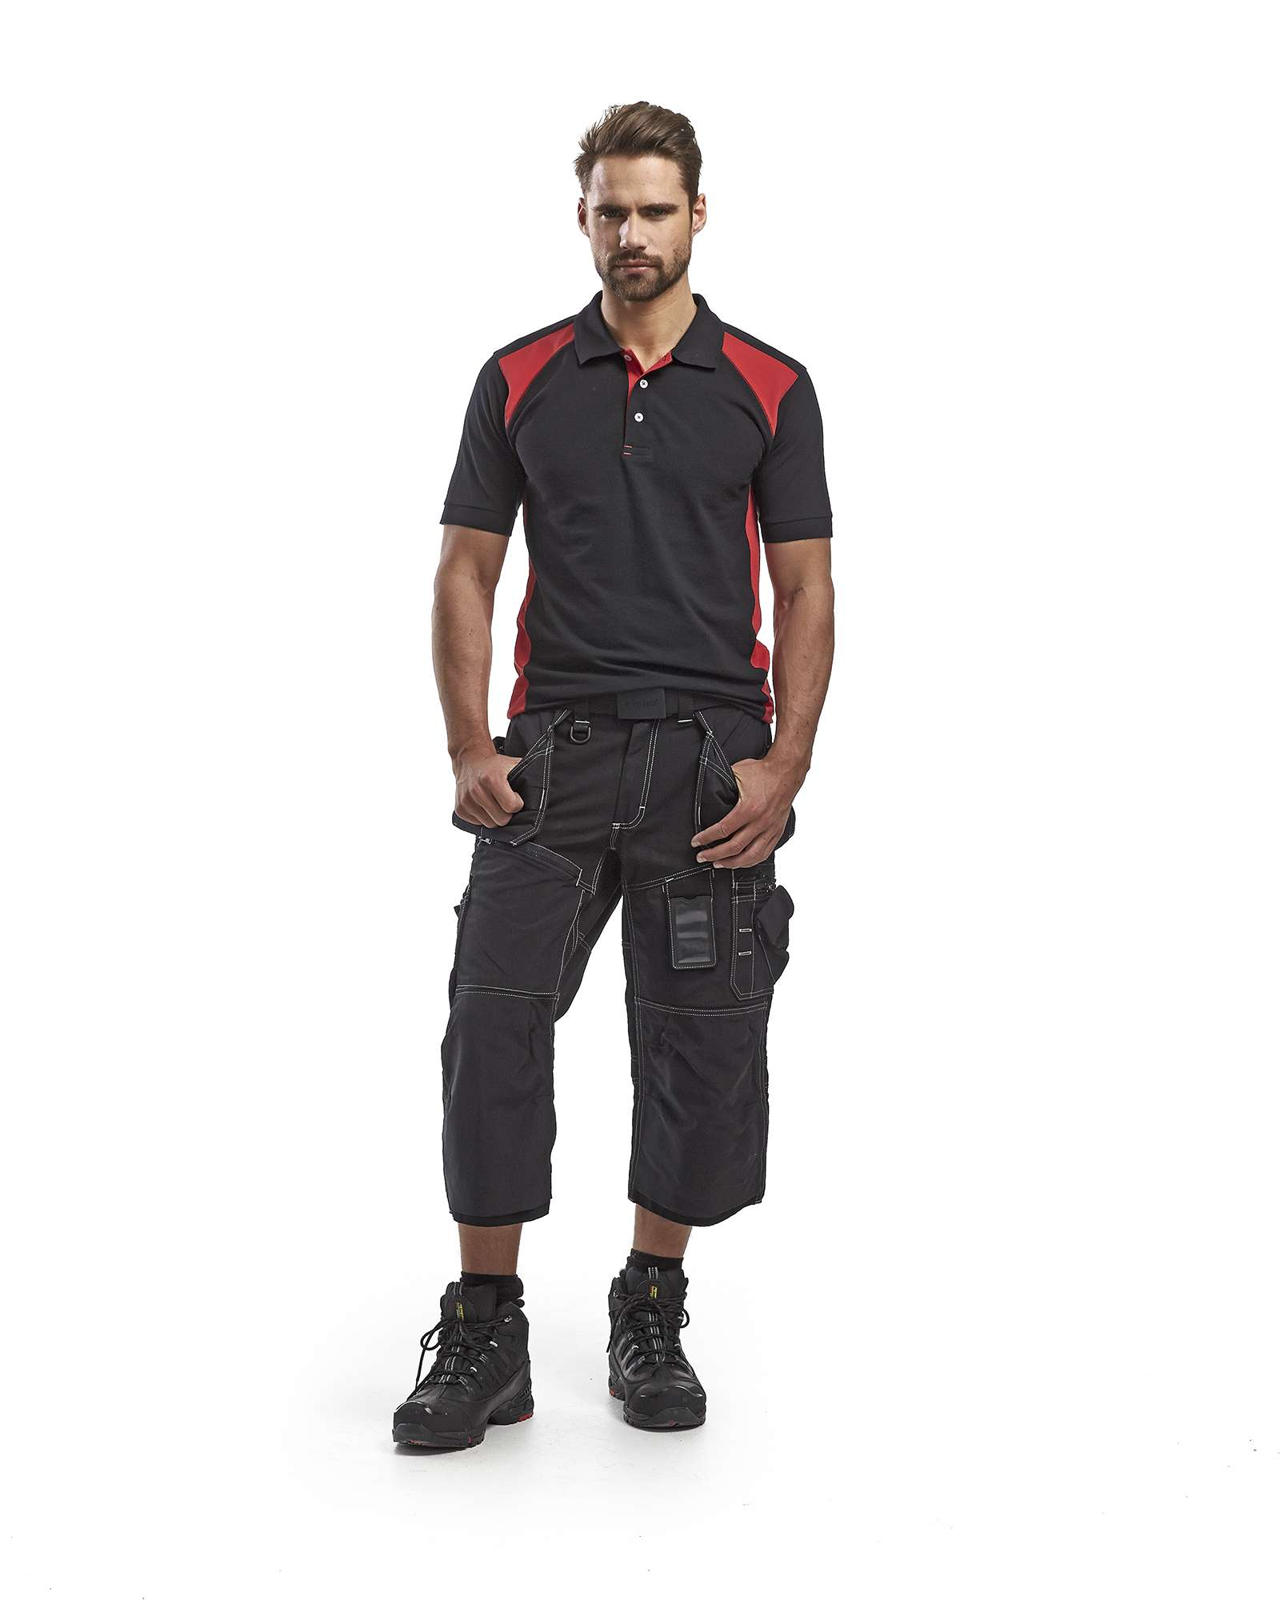 Blaklader Piraatbroeken 15011310 zwart(9900)